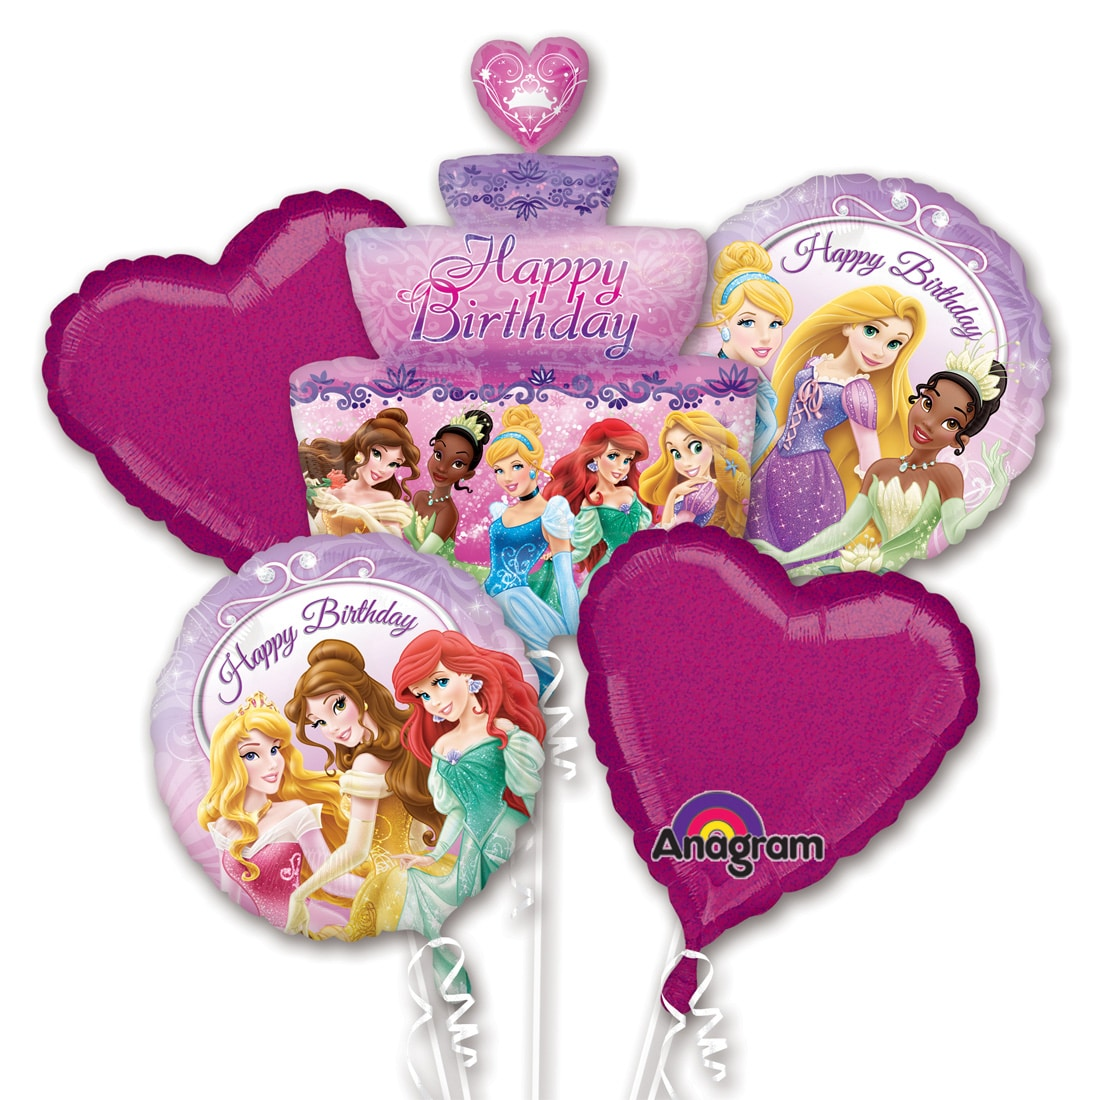 Disney Princess Birthday Cake Balloon Bouquet Inflated